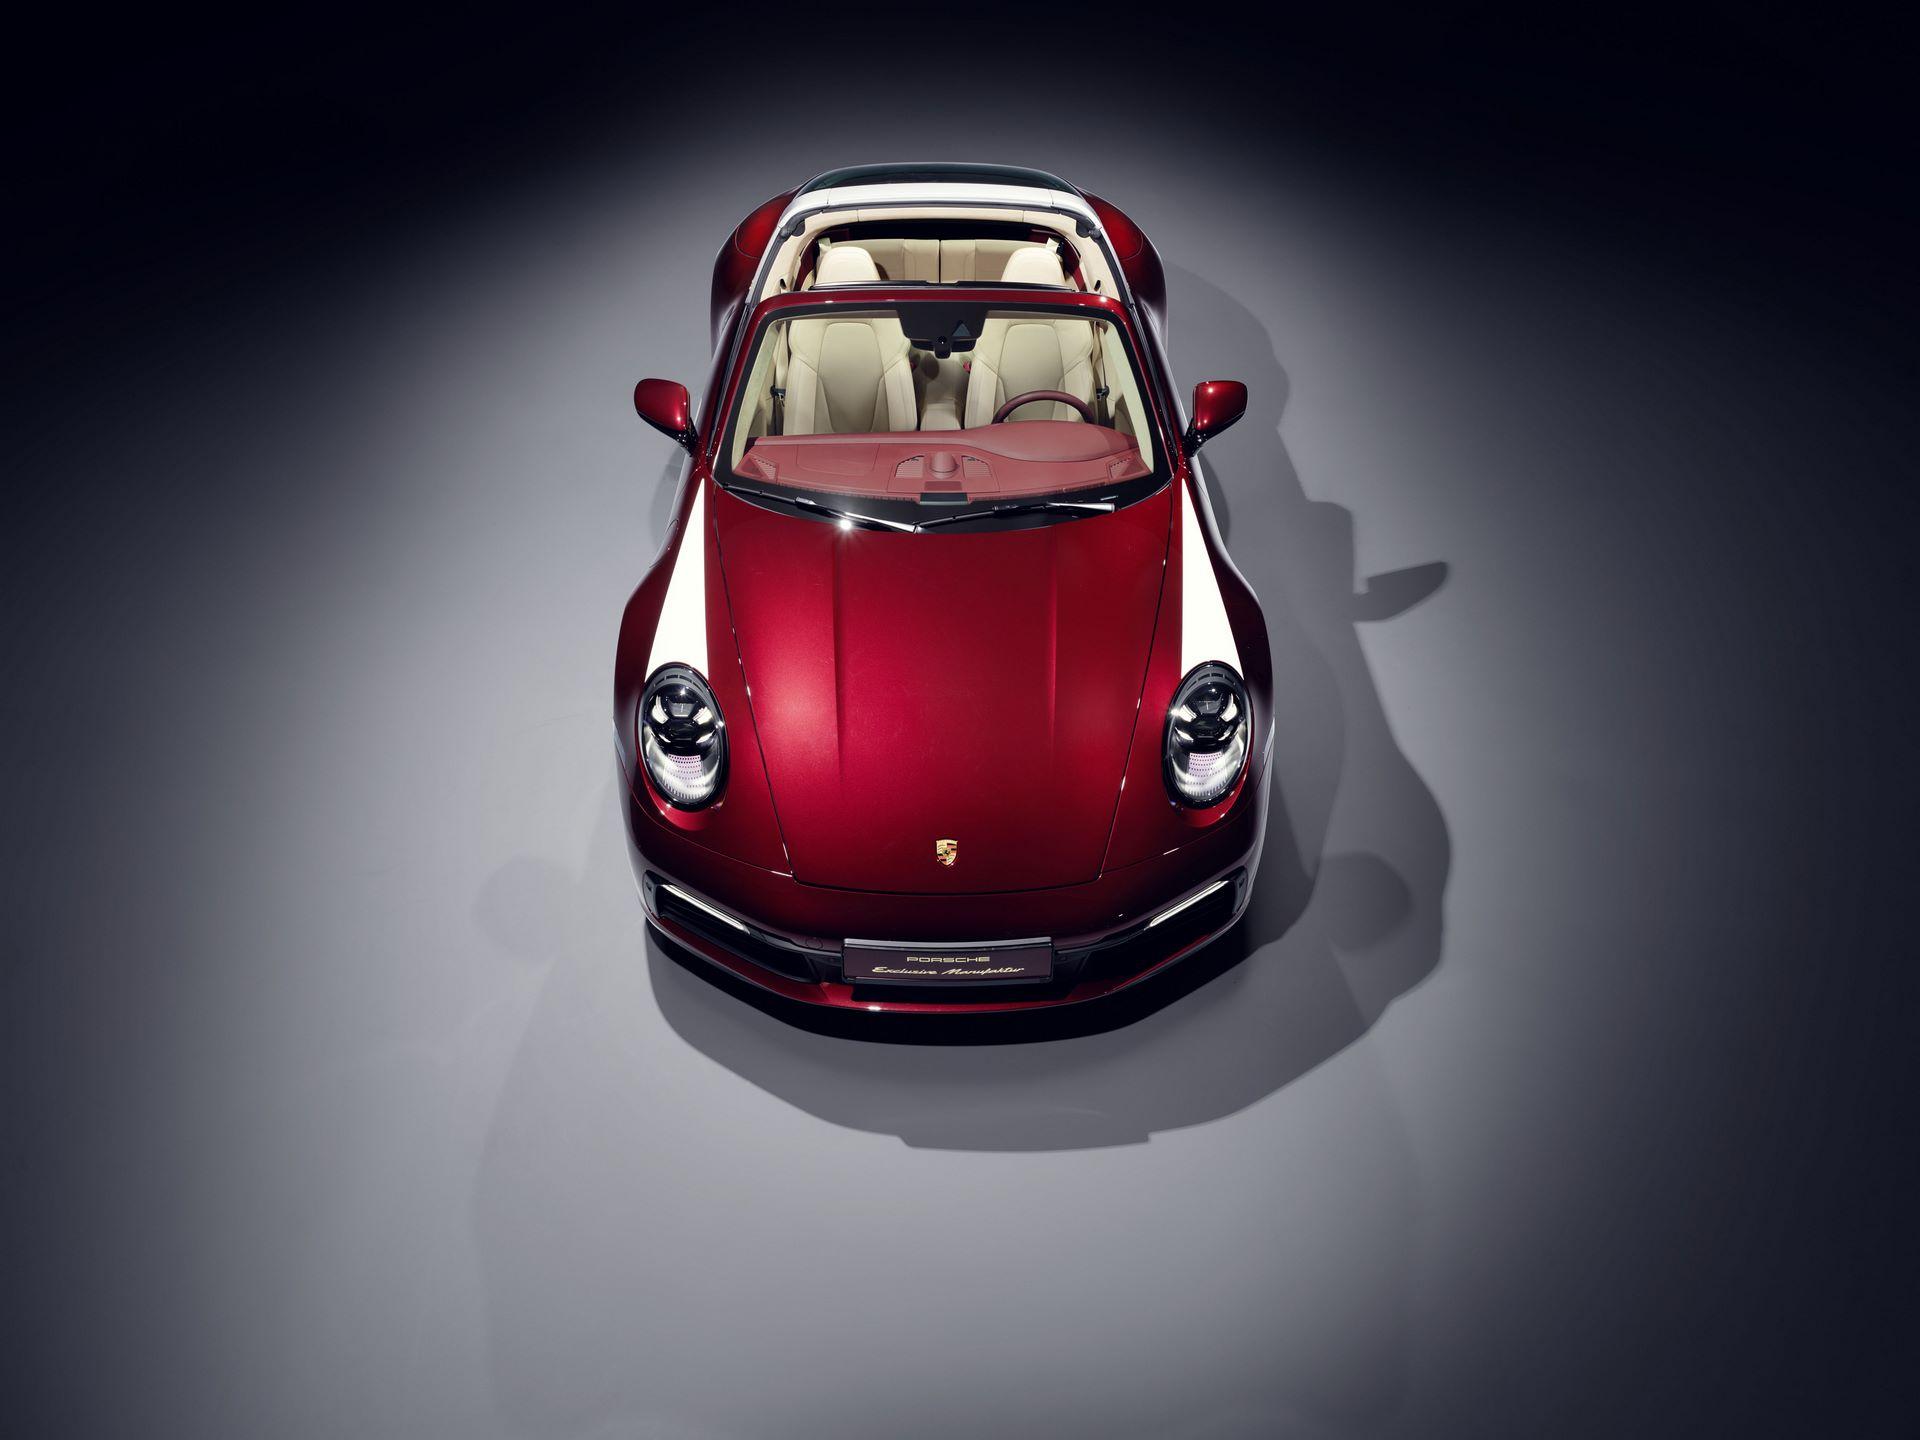 Porsche-911-Targa-4S-Heritage-Design-Edition-40